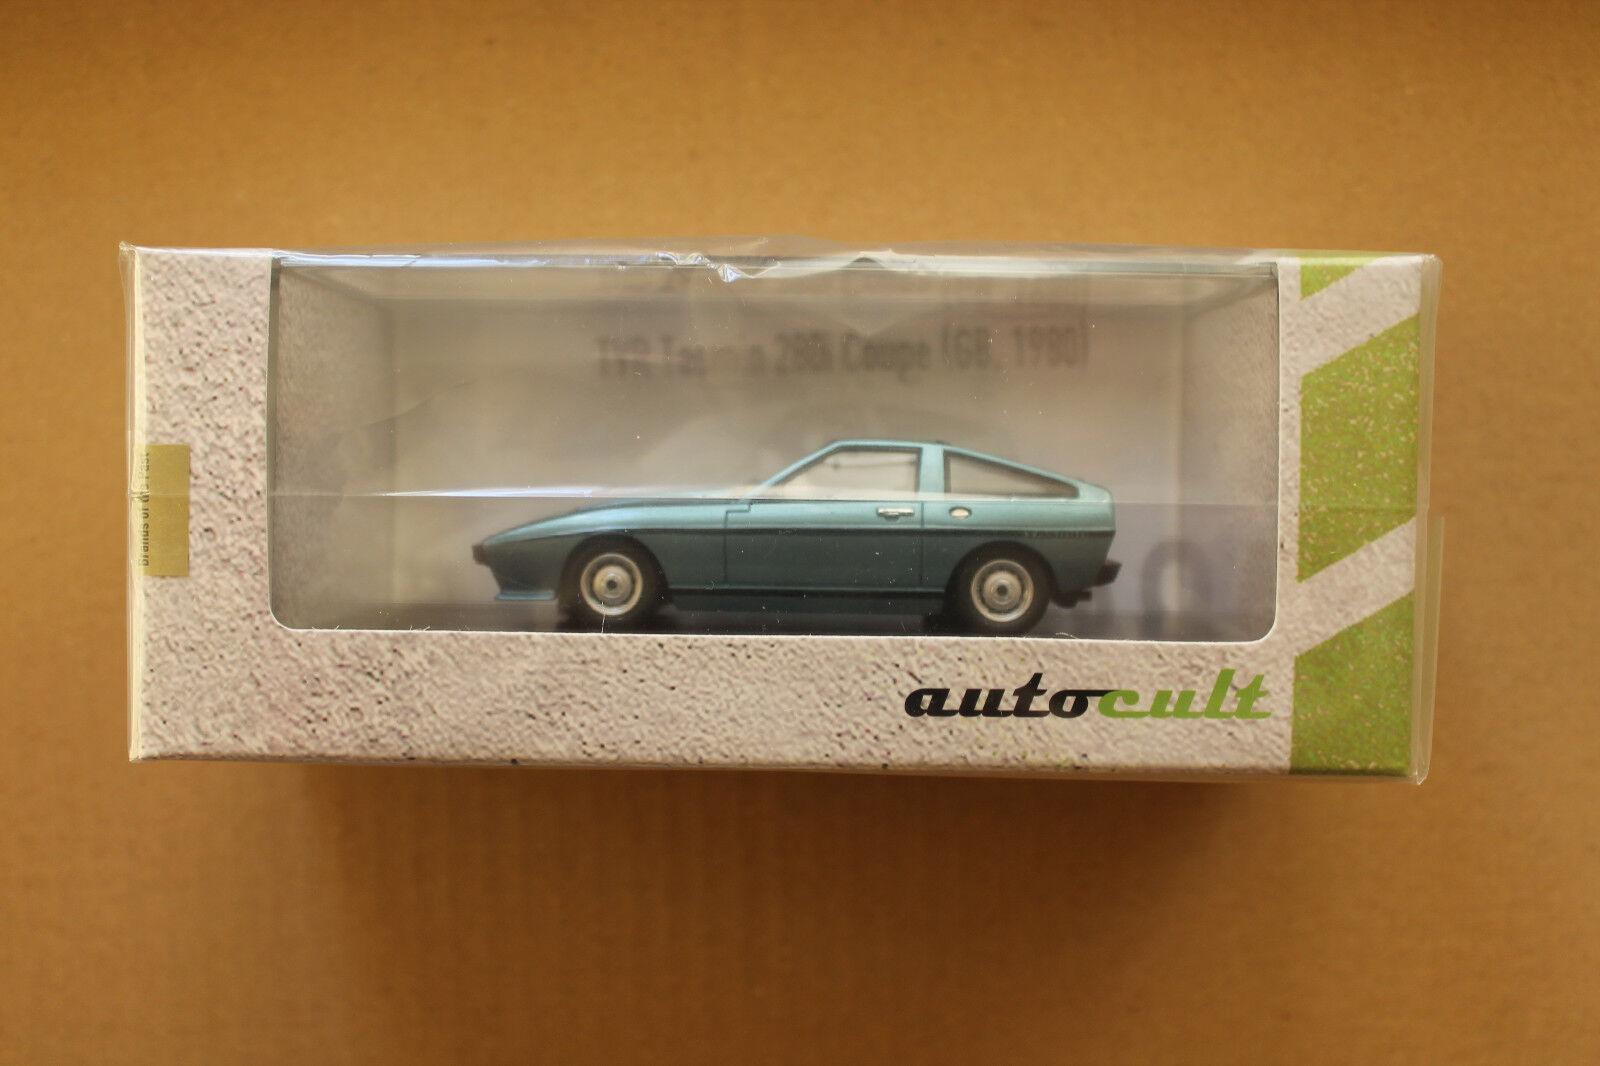 Autocult 1 43  02010 tvr tasmin coupé - blau metallic von 1980